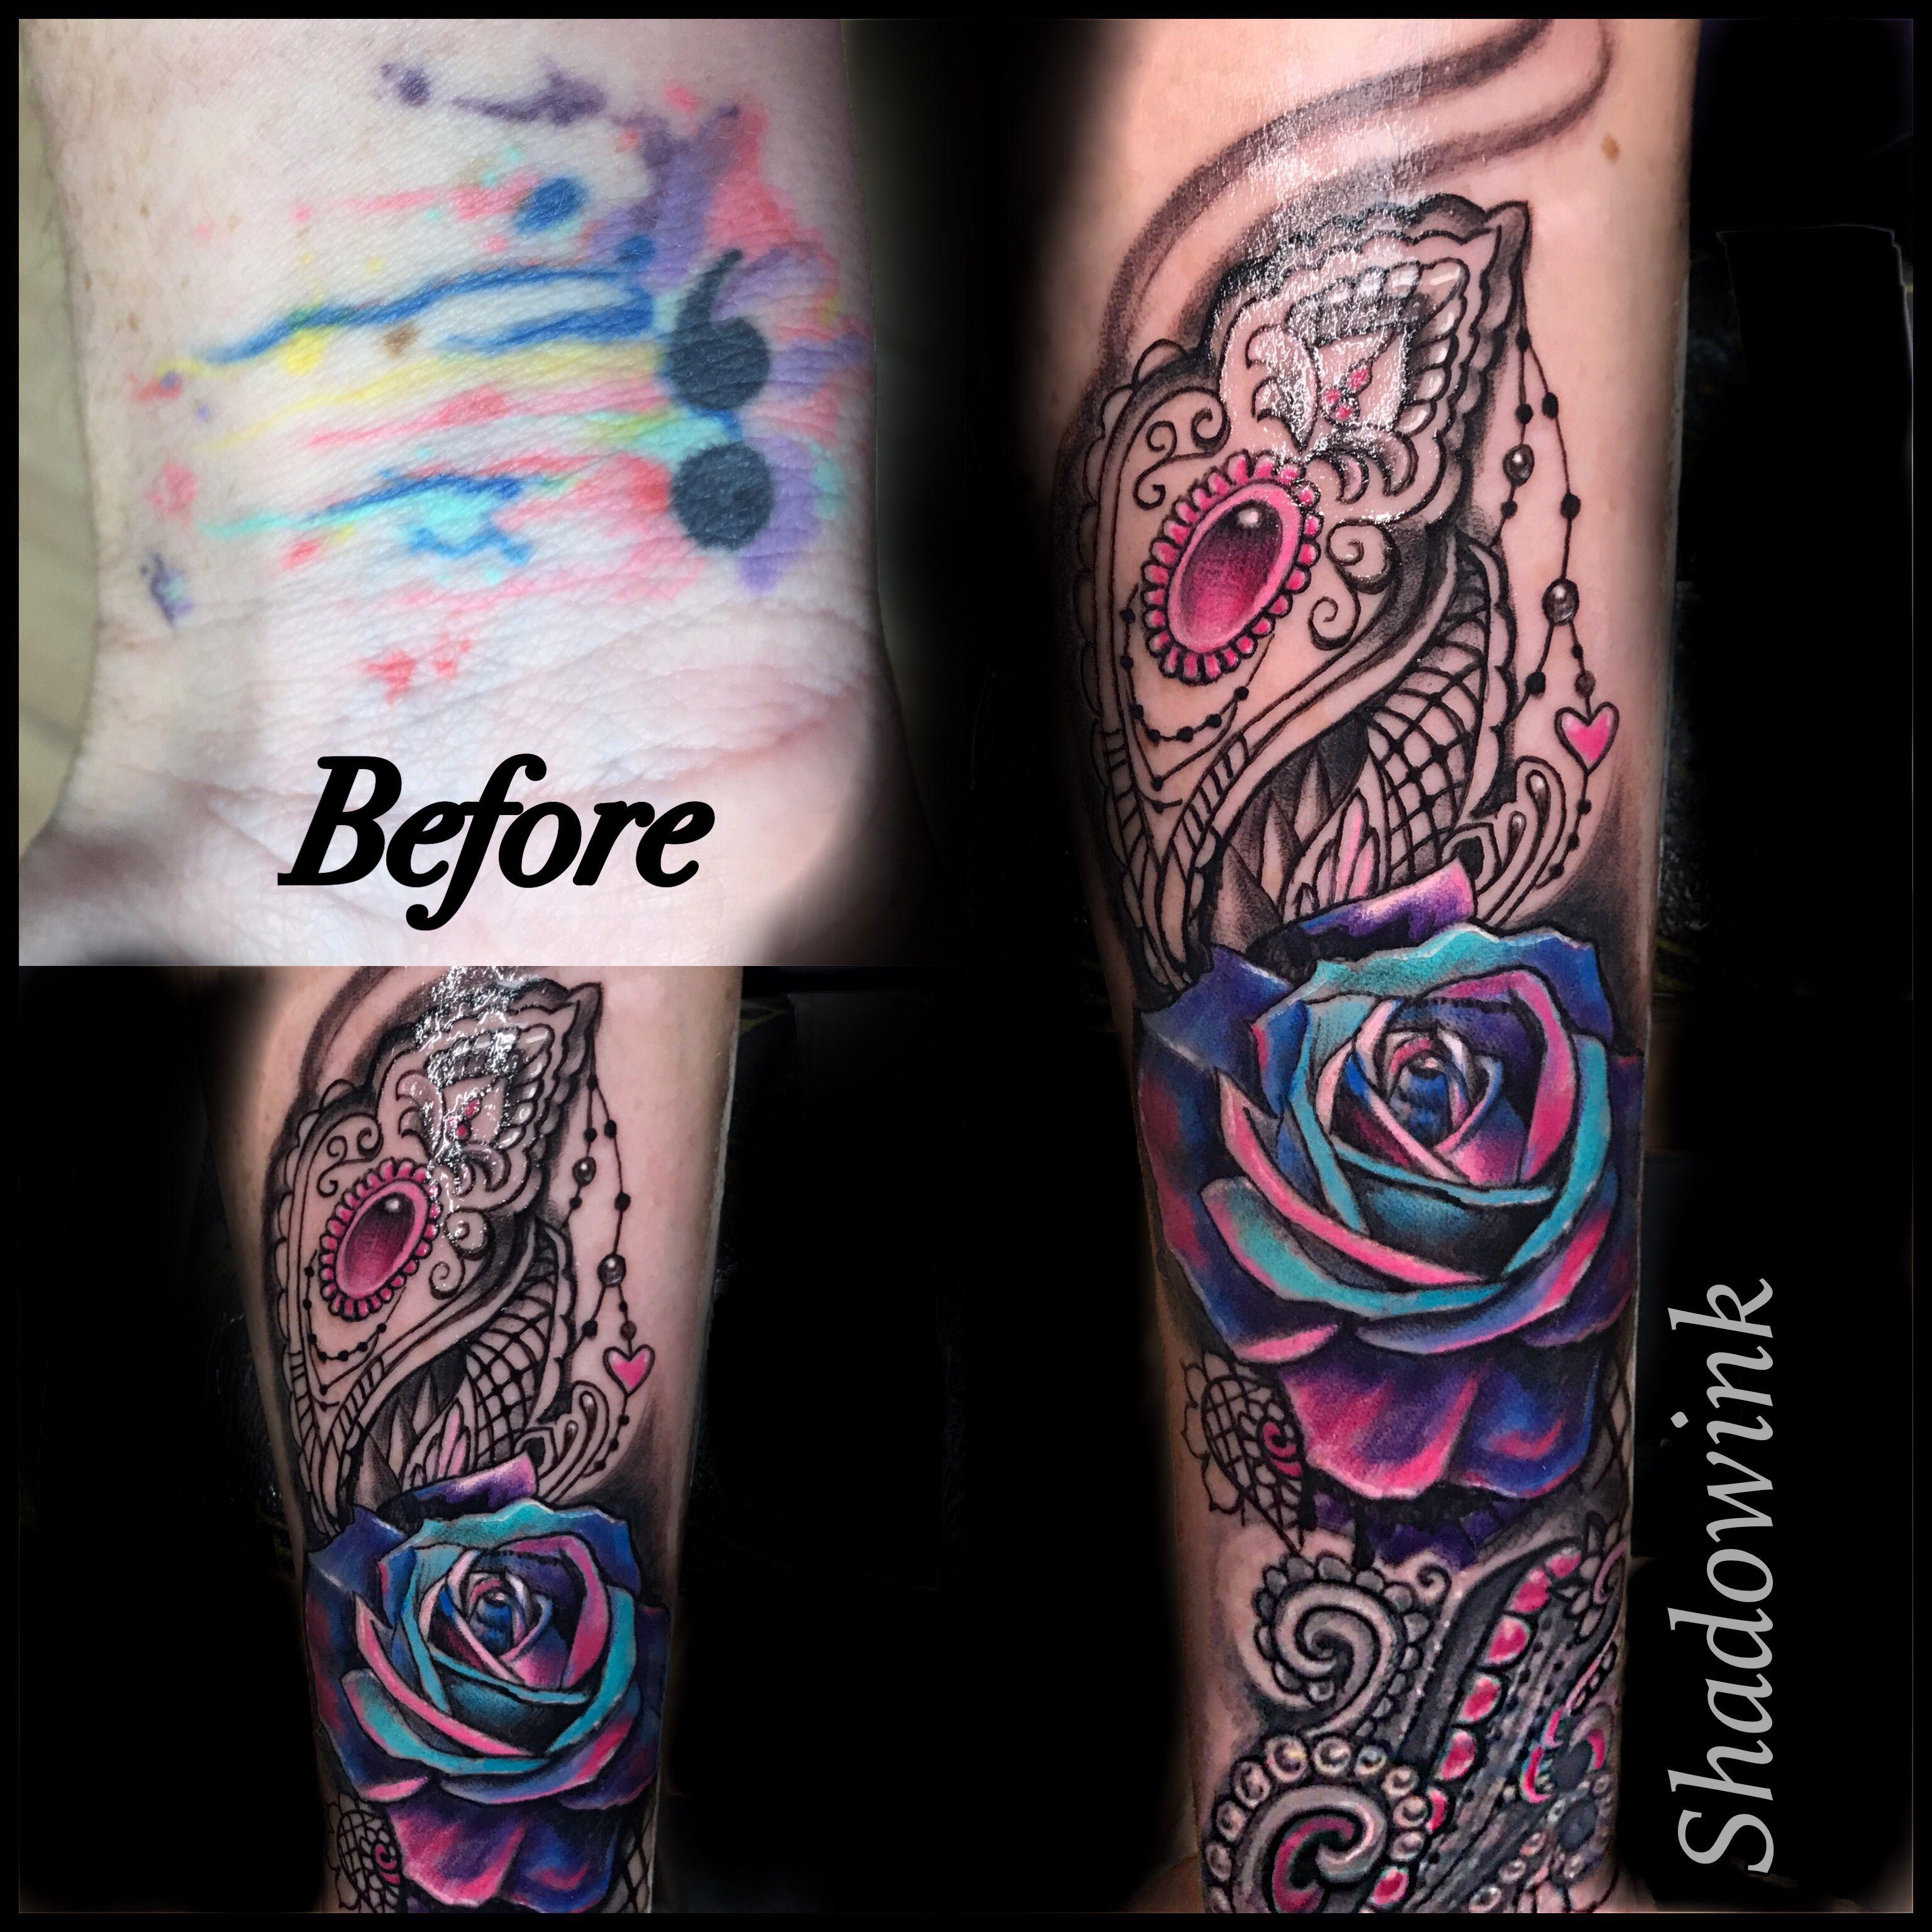 Half Sleeve Forearm Tattoo Designs: Super Happy W This Coverup Turned Half Sleeve!! Inner